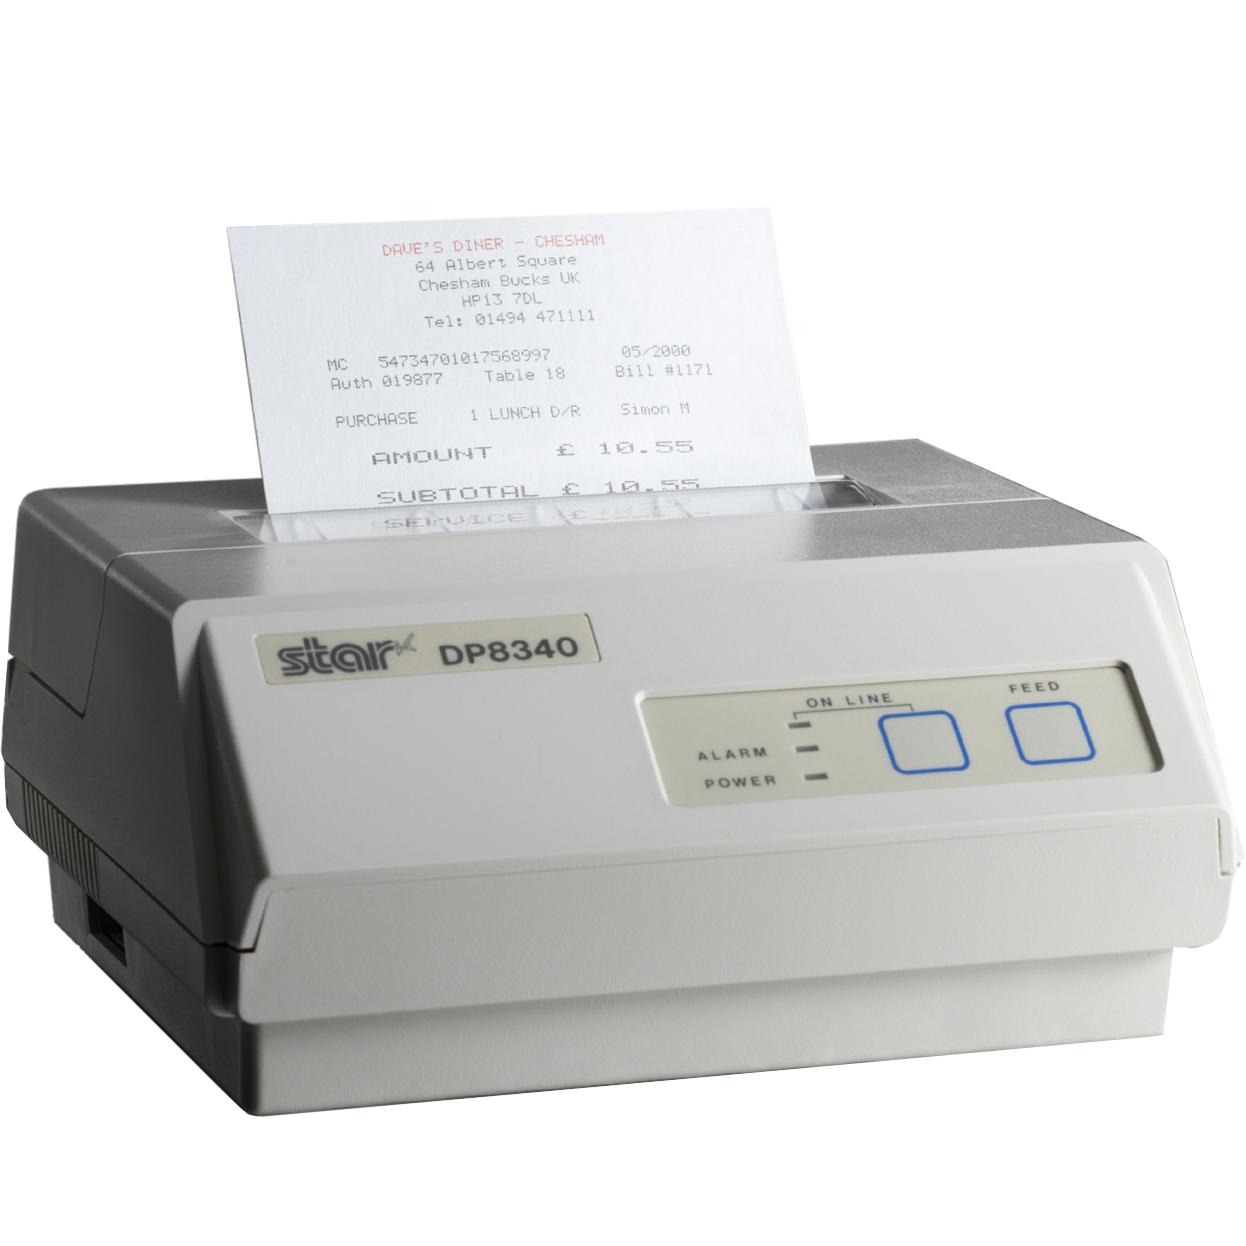 DP8340